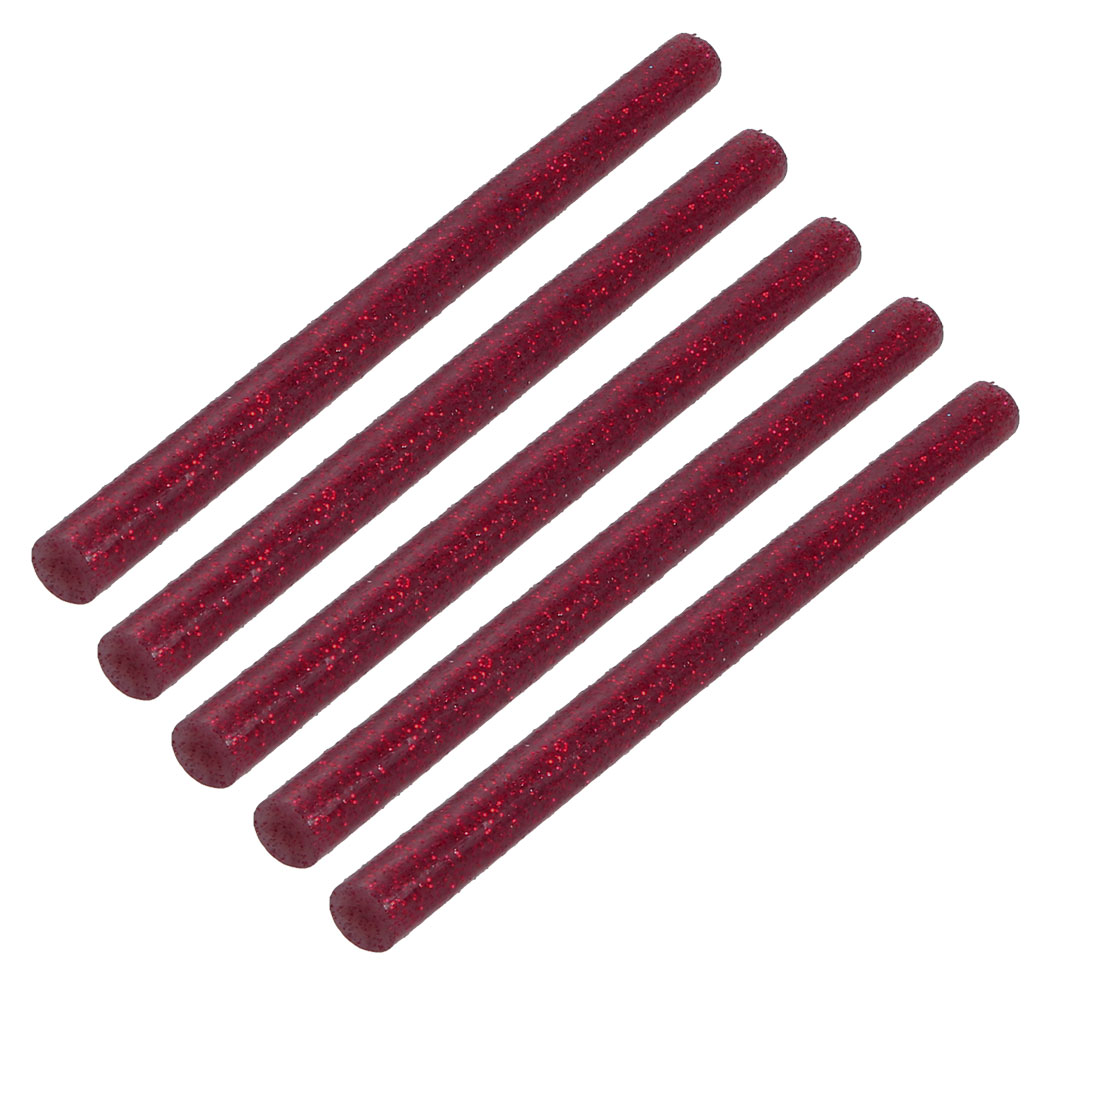 5pcs 7mm Dia. 100mm Long Hot Melt Glue Adhesive Stick Shinning Red